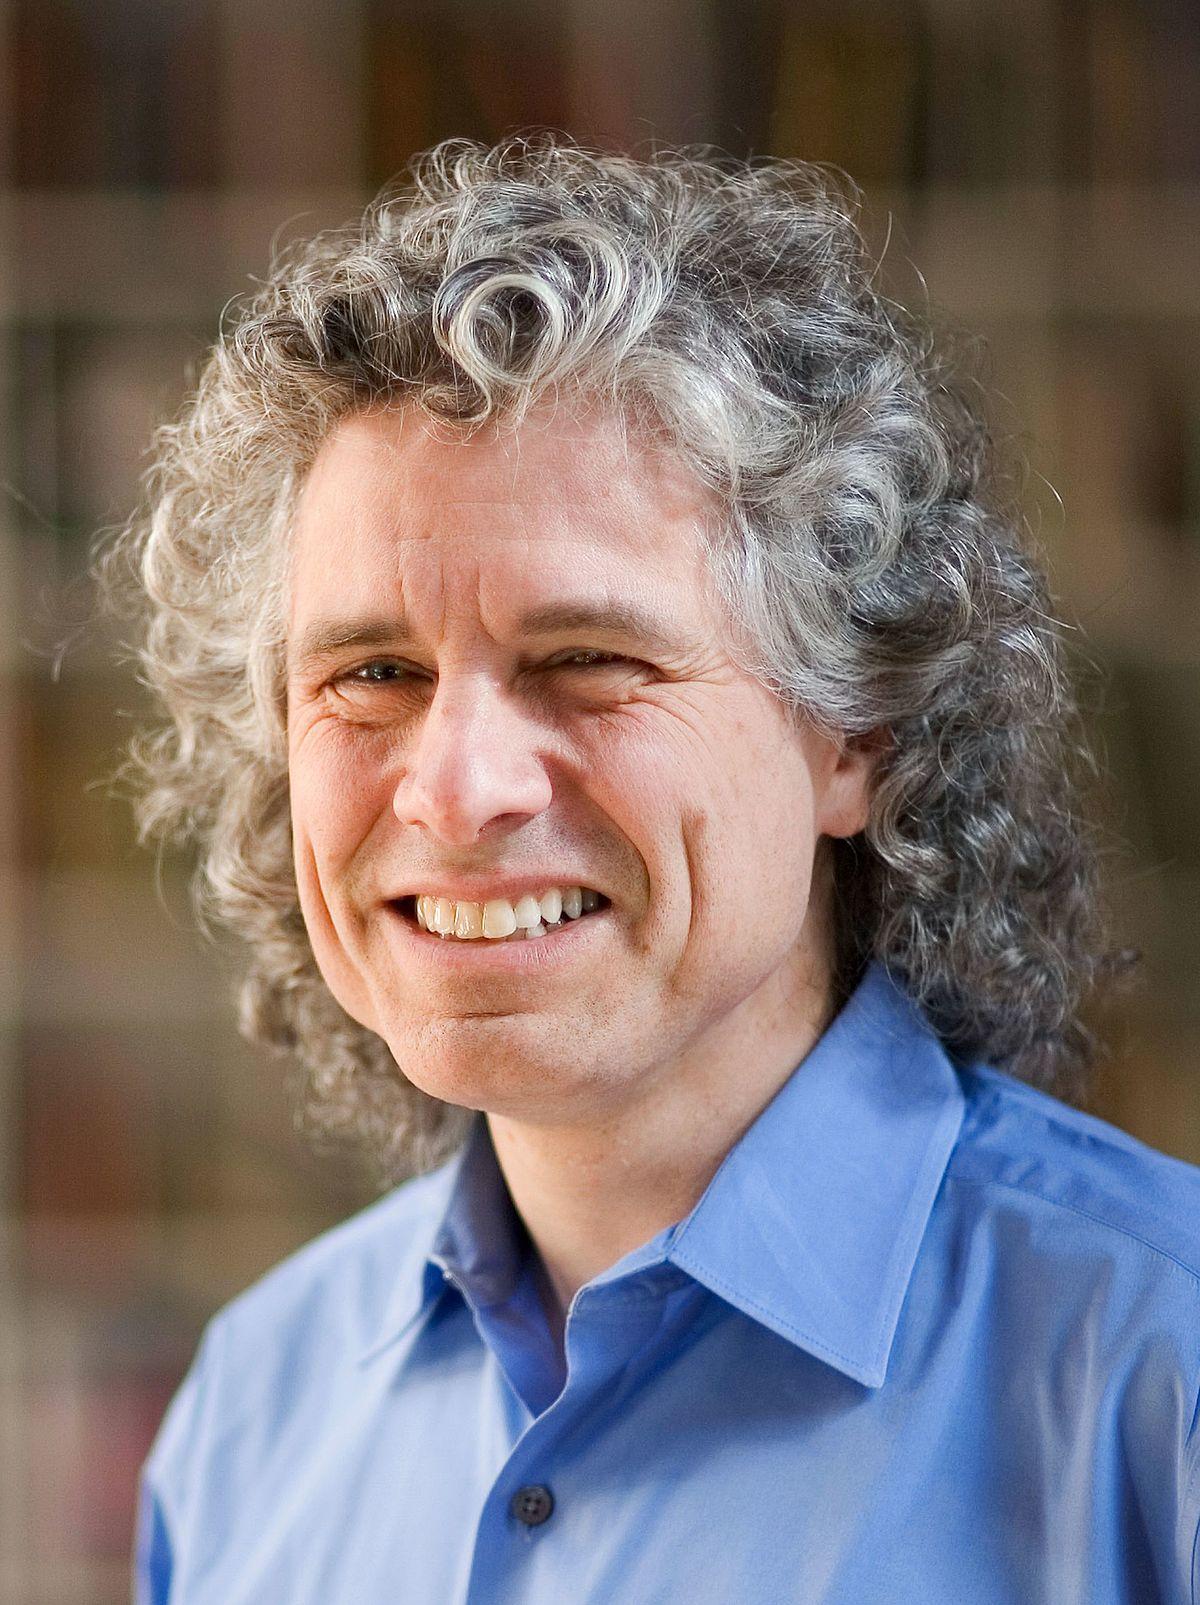 The Steven Lomazow Collection: Steven Pinker